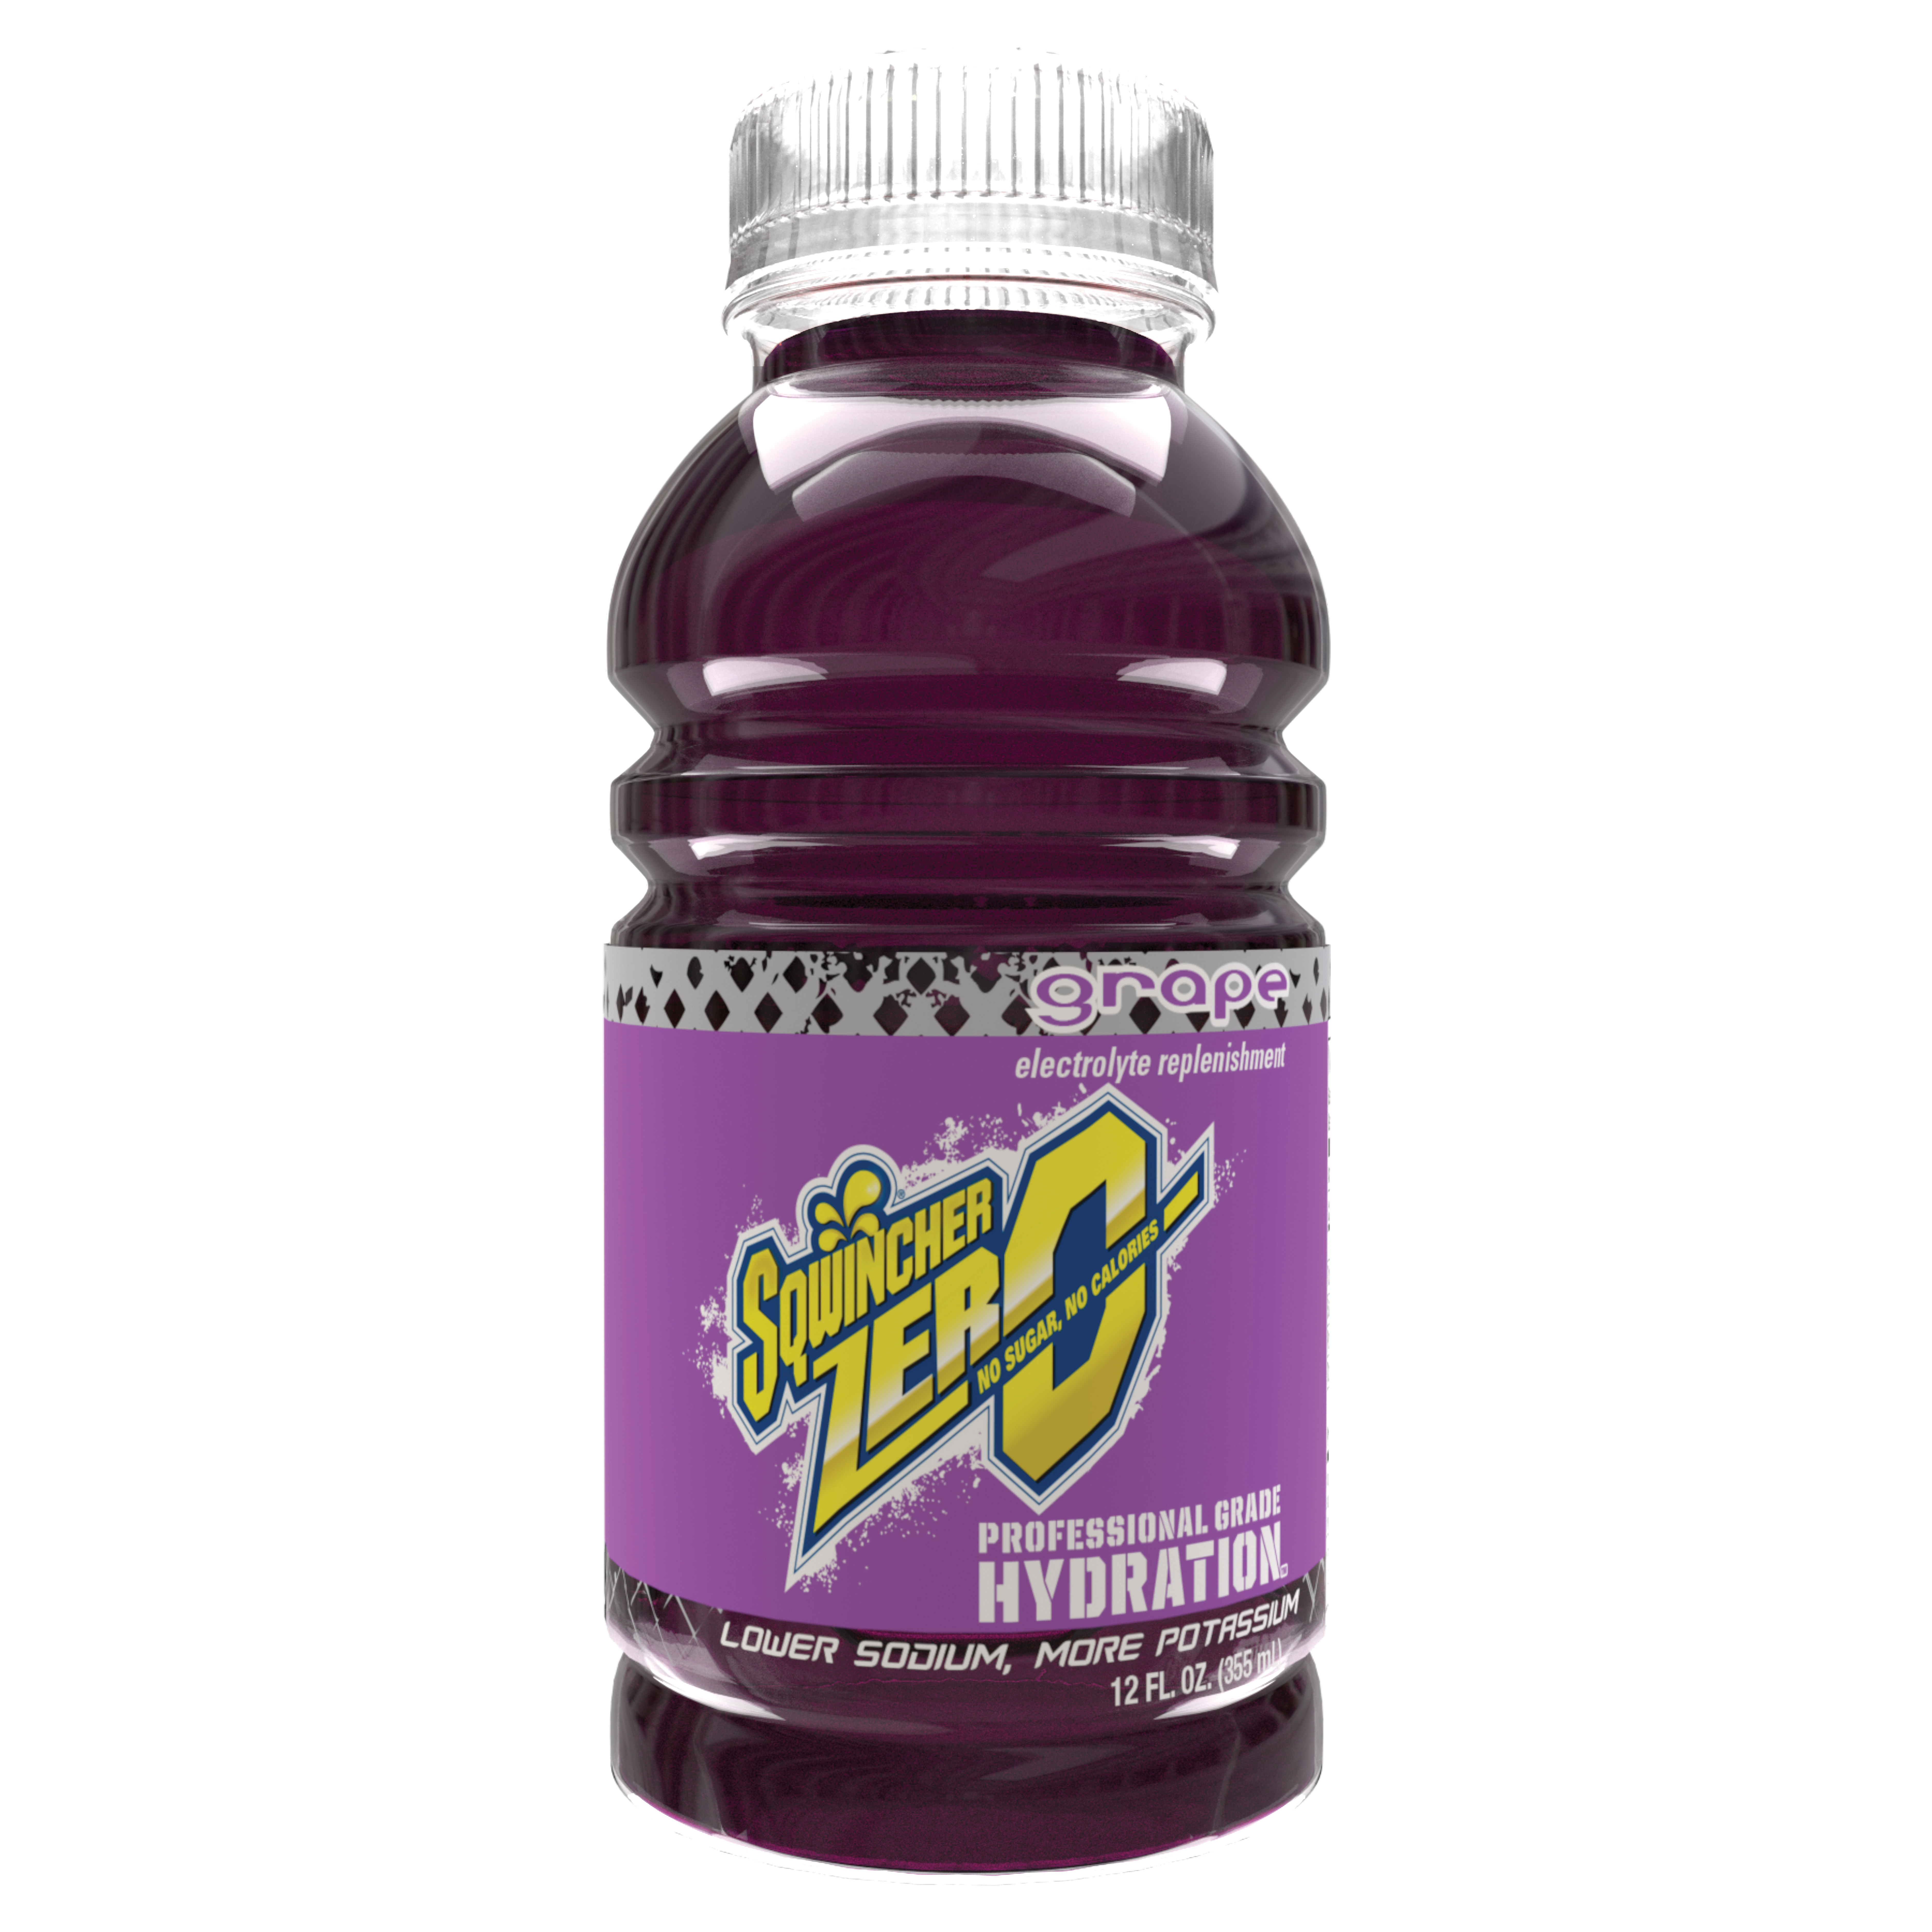 Sqwincher® 030922-GR Widemouth ZERO Sports Drink, 12 oz Ready-To-Drink Plastic Bottle, Liquid, Grape